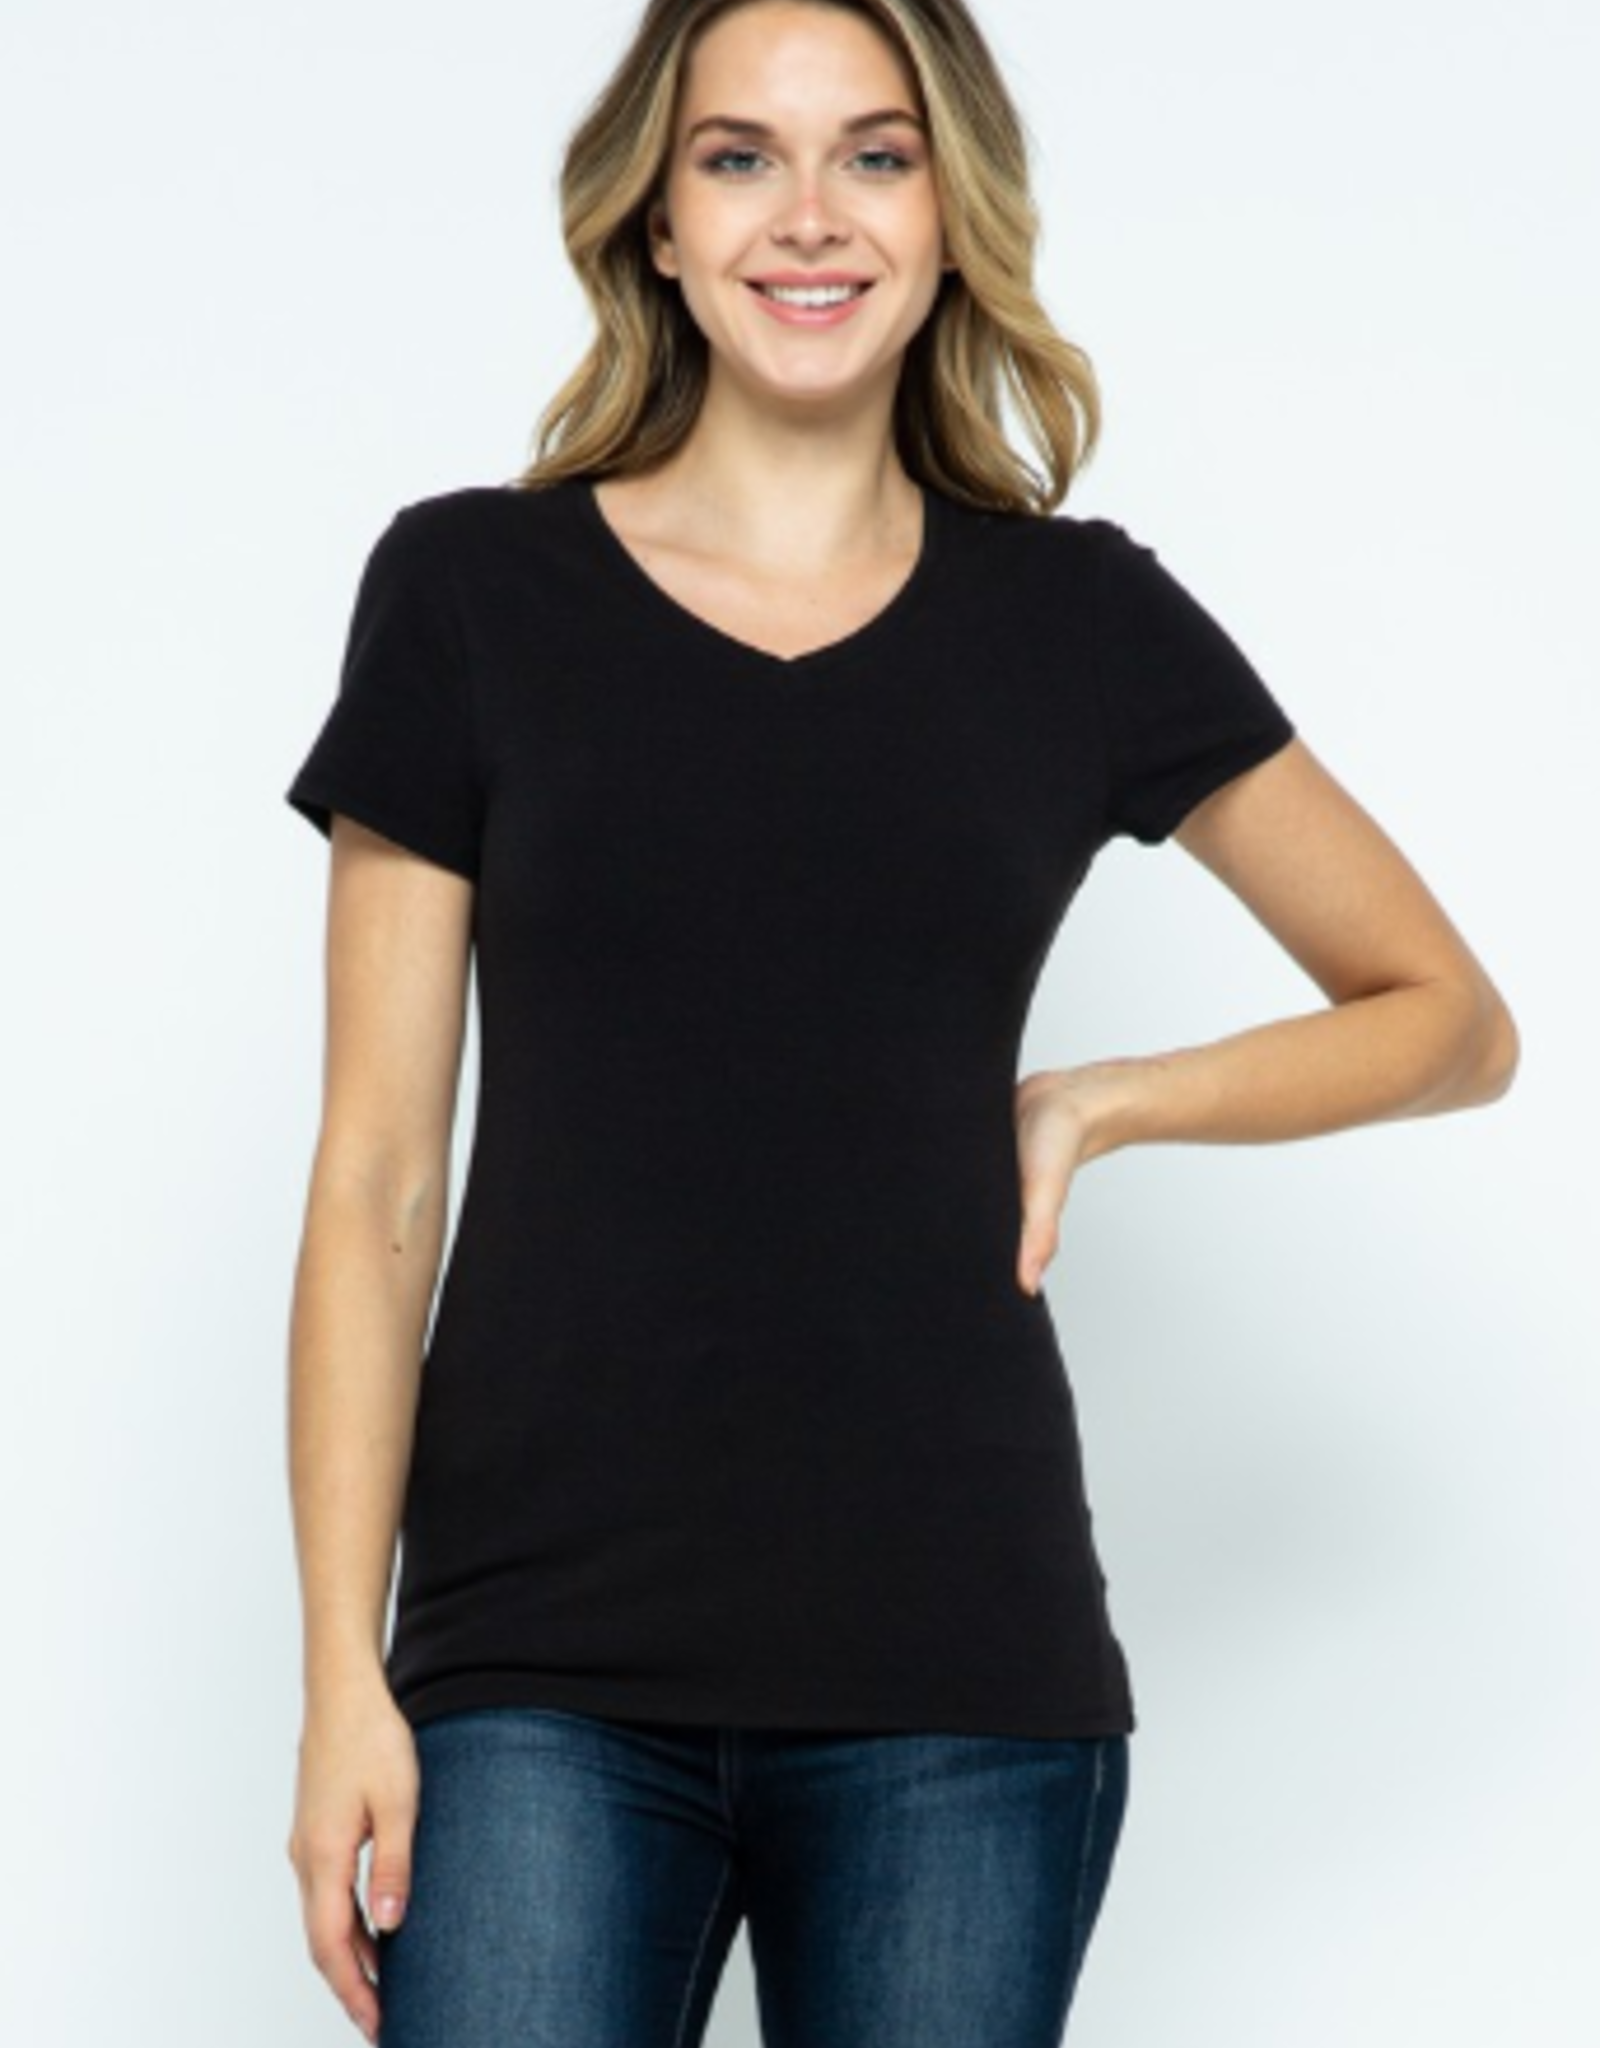 Cielo V-neck t-shirts